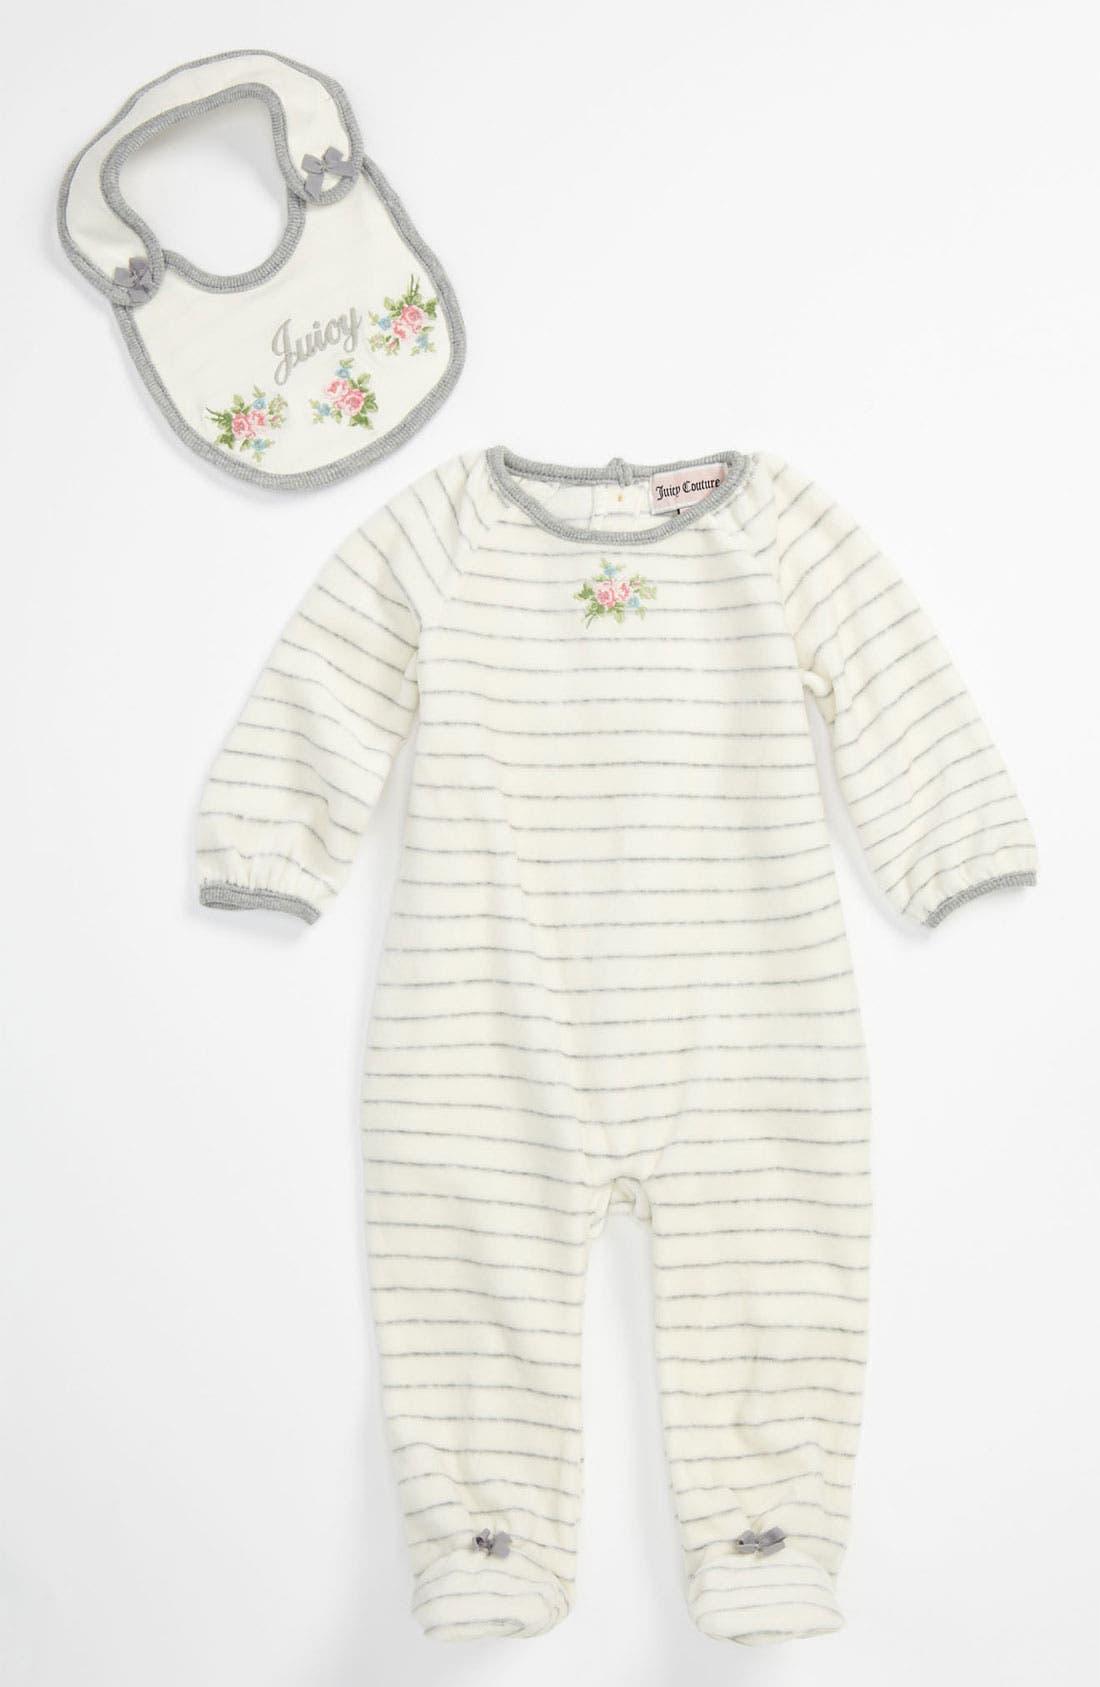 Alternate Image 1 Selected - Juicy Couture Velour Footie & Bib (Infant)